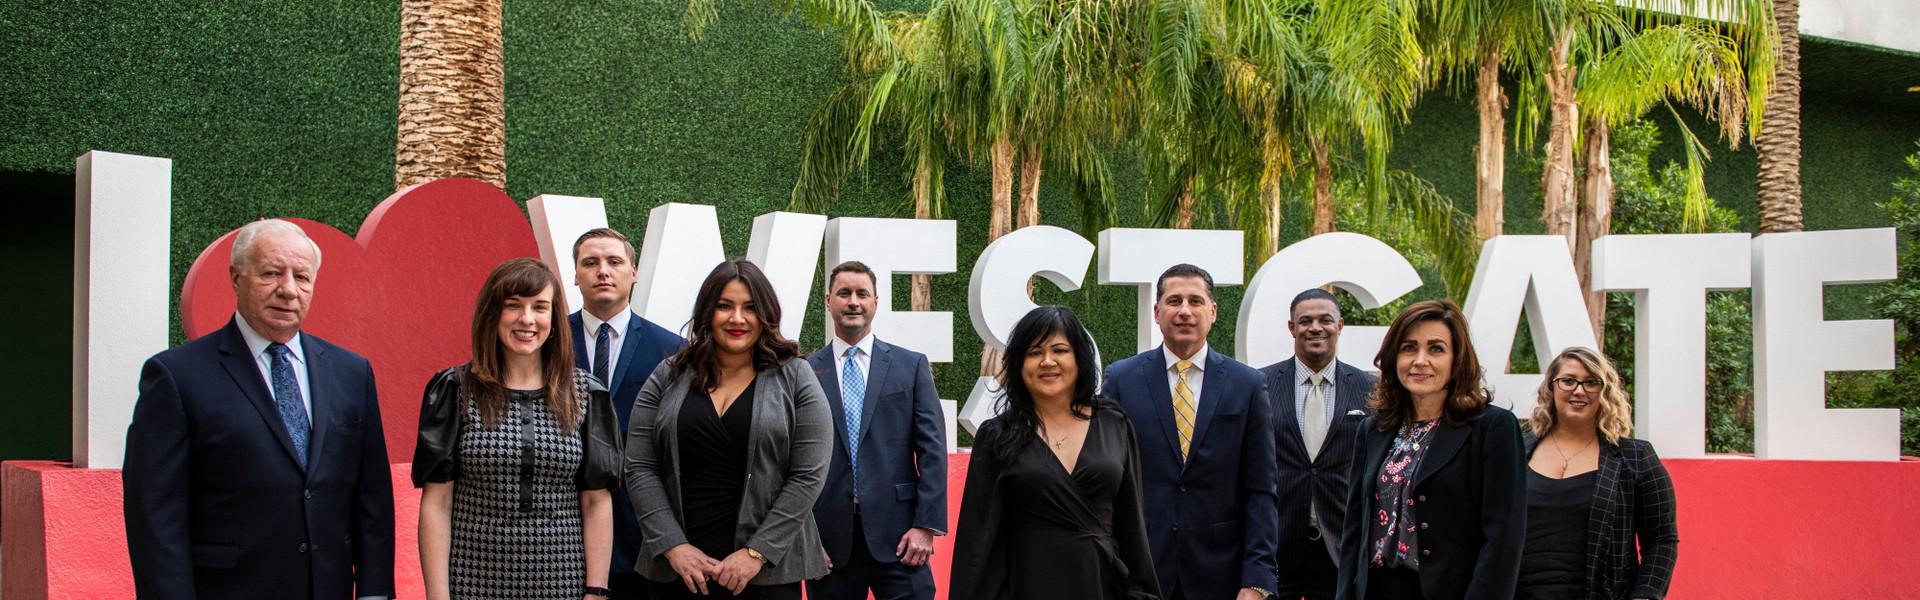 Meet your Westgate Las Vegas Casino Hosts   Group of Casino Hosts